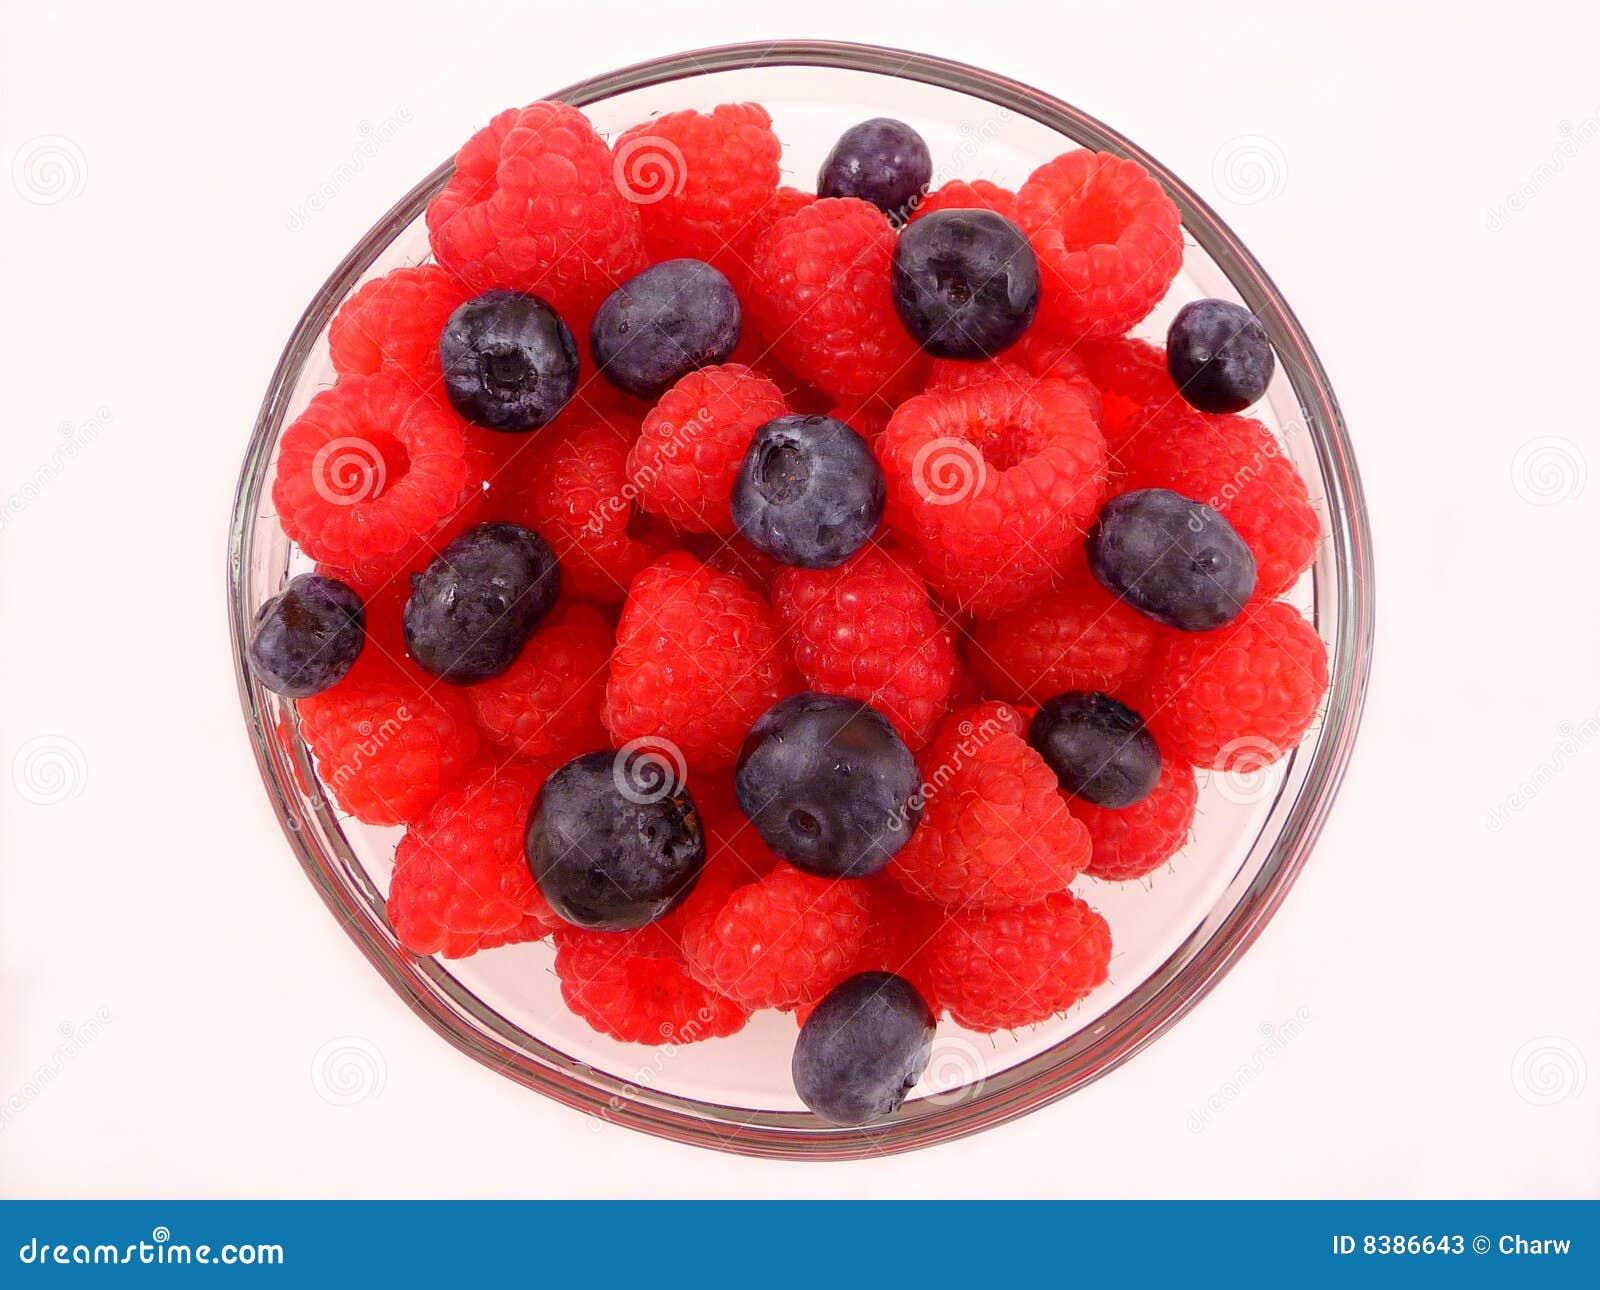 Fresh Bowl Of Raspberries And Blueberries Stock Image ...